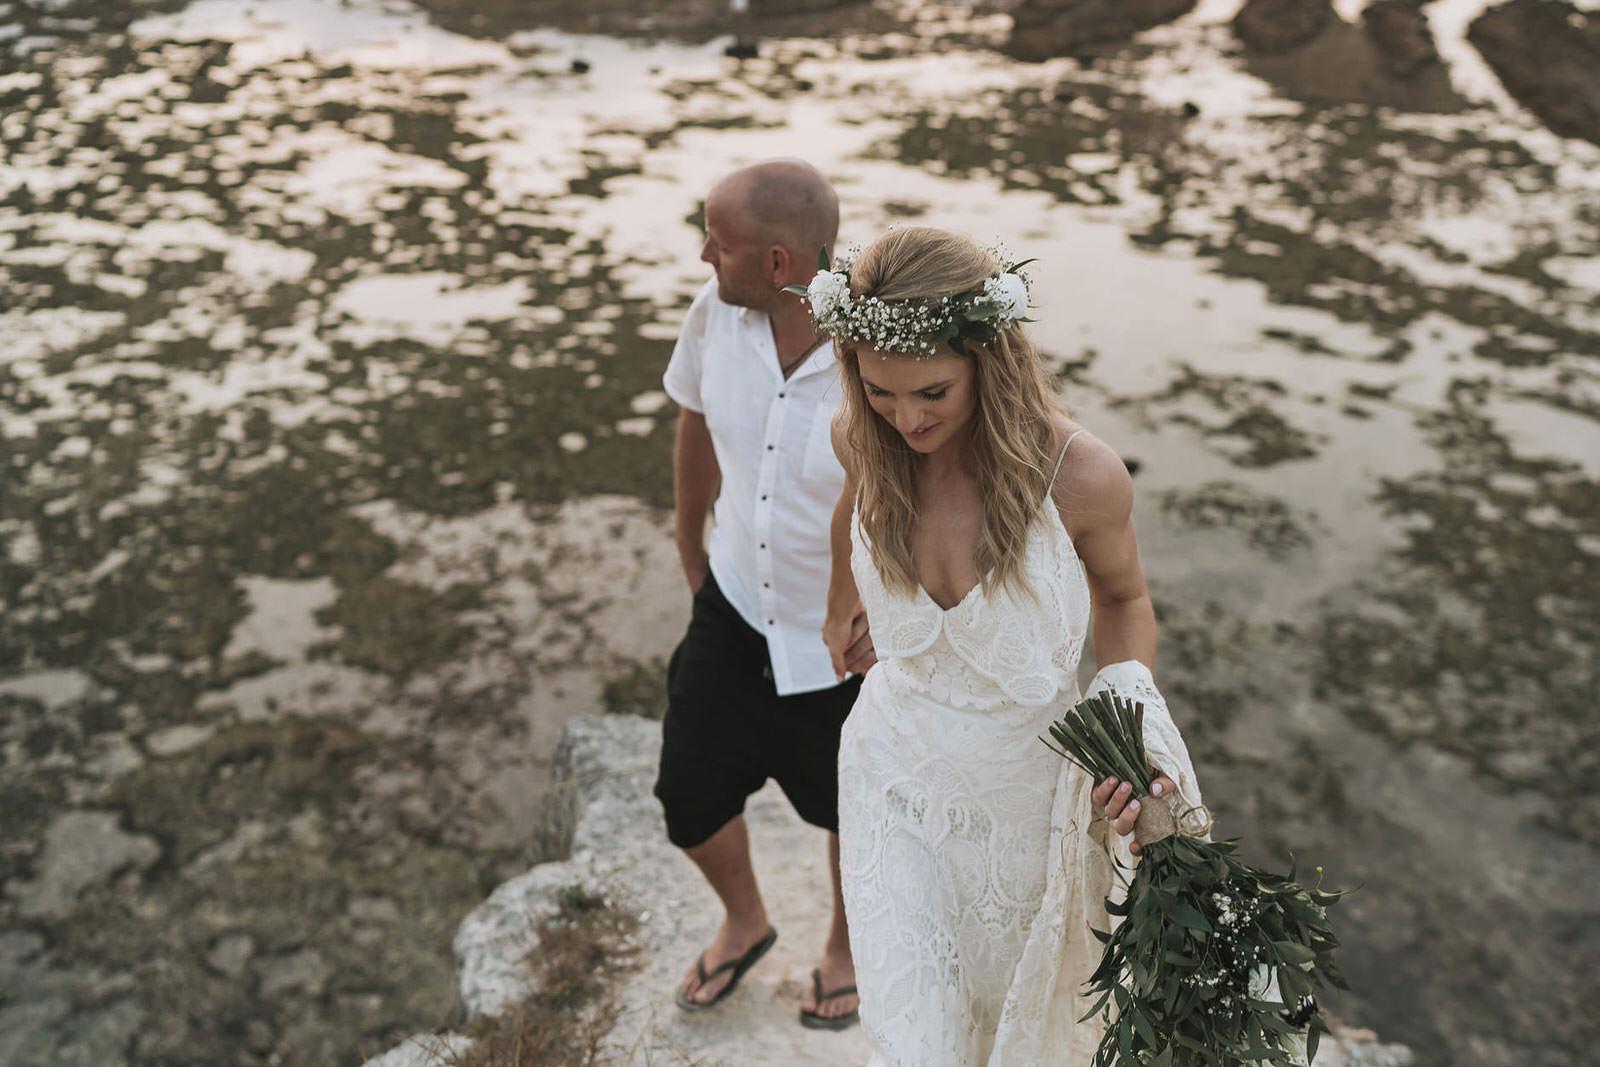 newfound-hai-tide-nusa-lembongan-bali-wedding-photographers-133